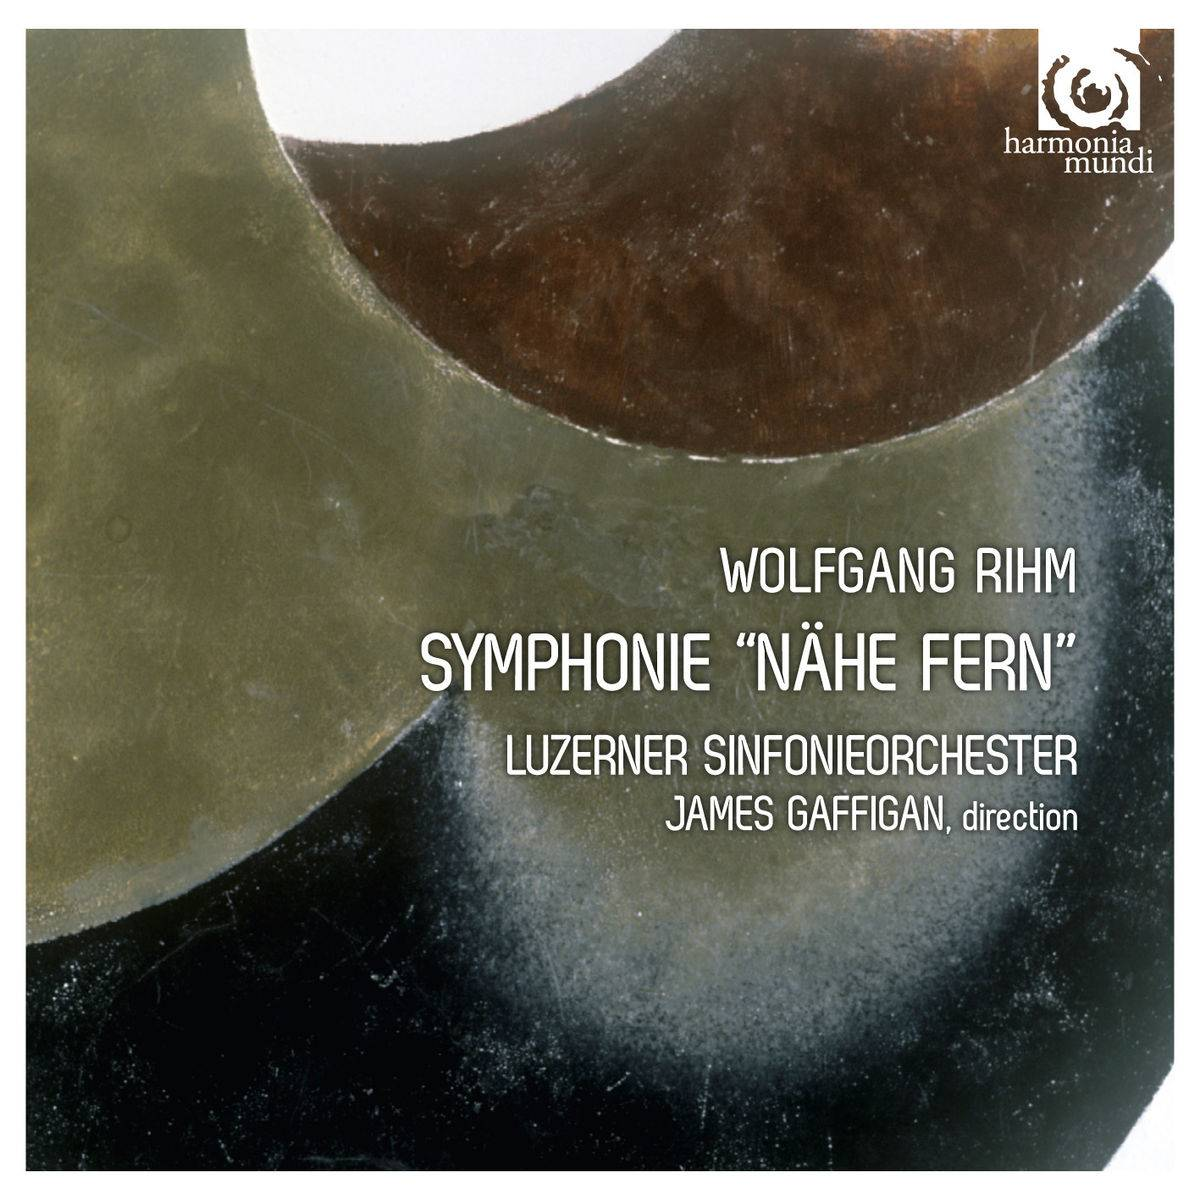 "Luzerner Sinfonieorchester & James Gaffigan - Rihm: Symphonie ""Nähe fern"" (2013) [Official Digital Download 24/96]"